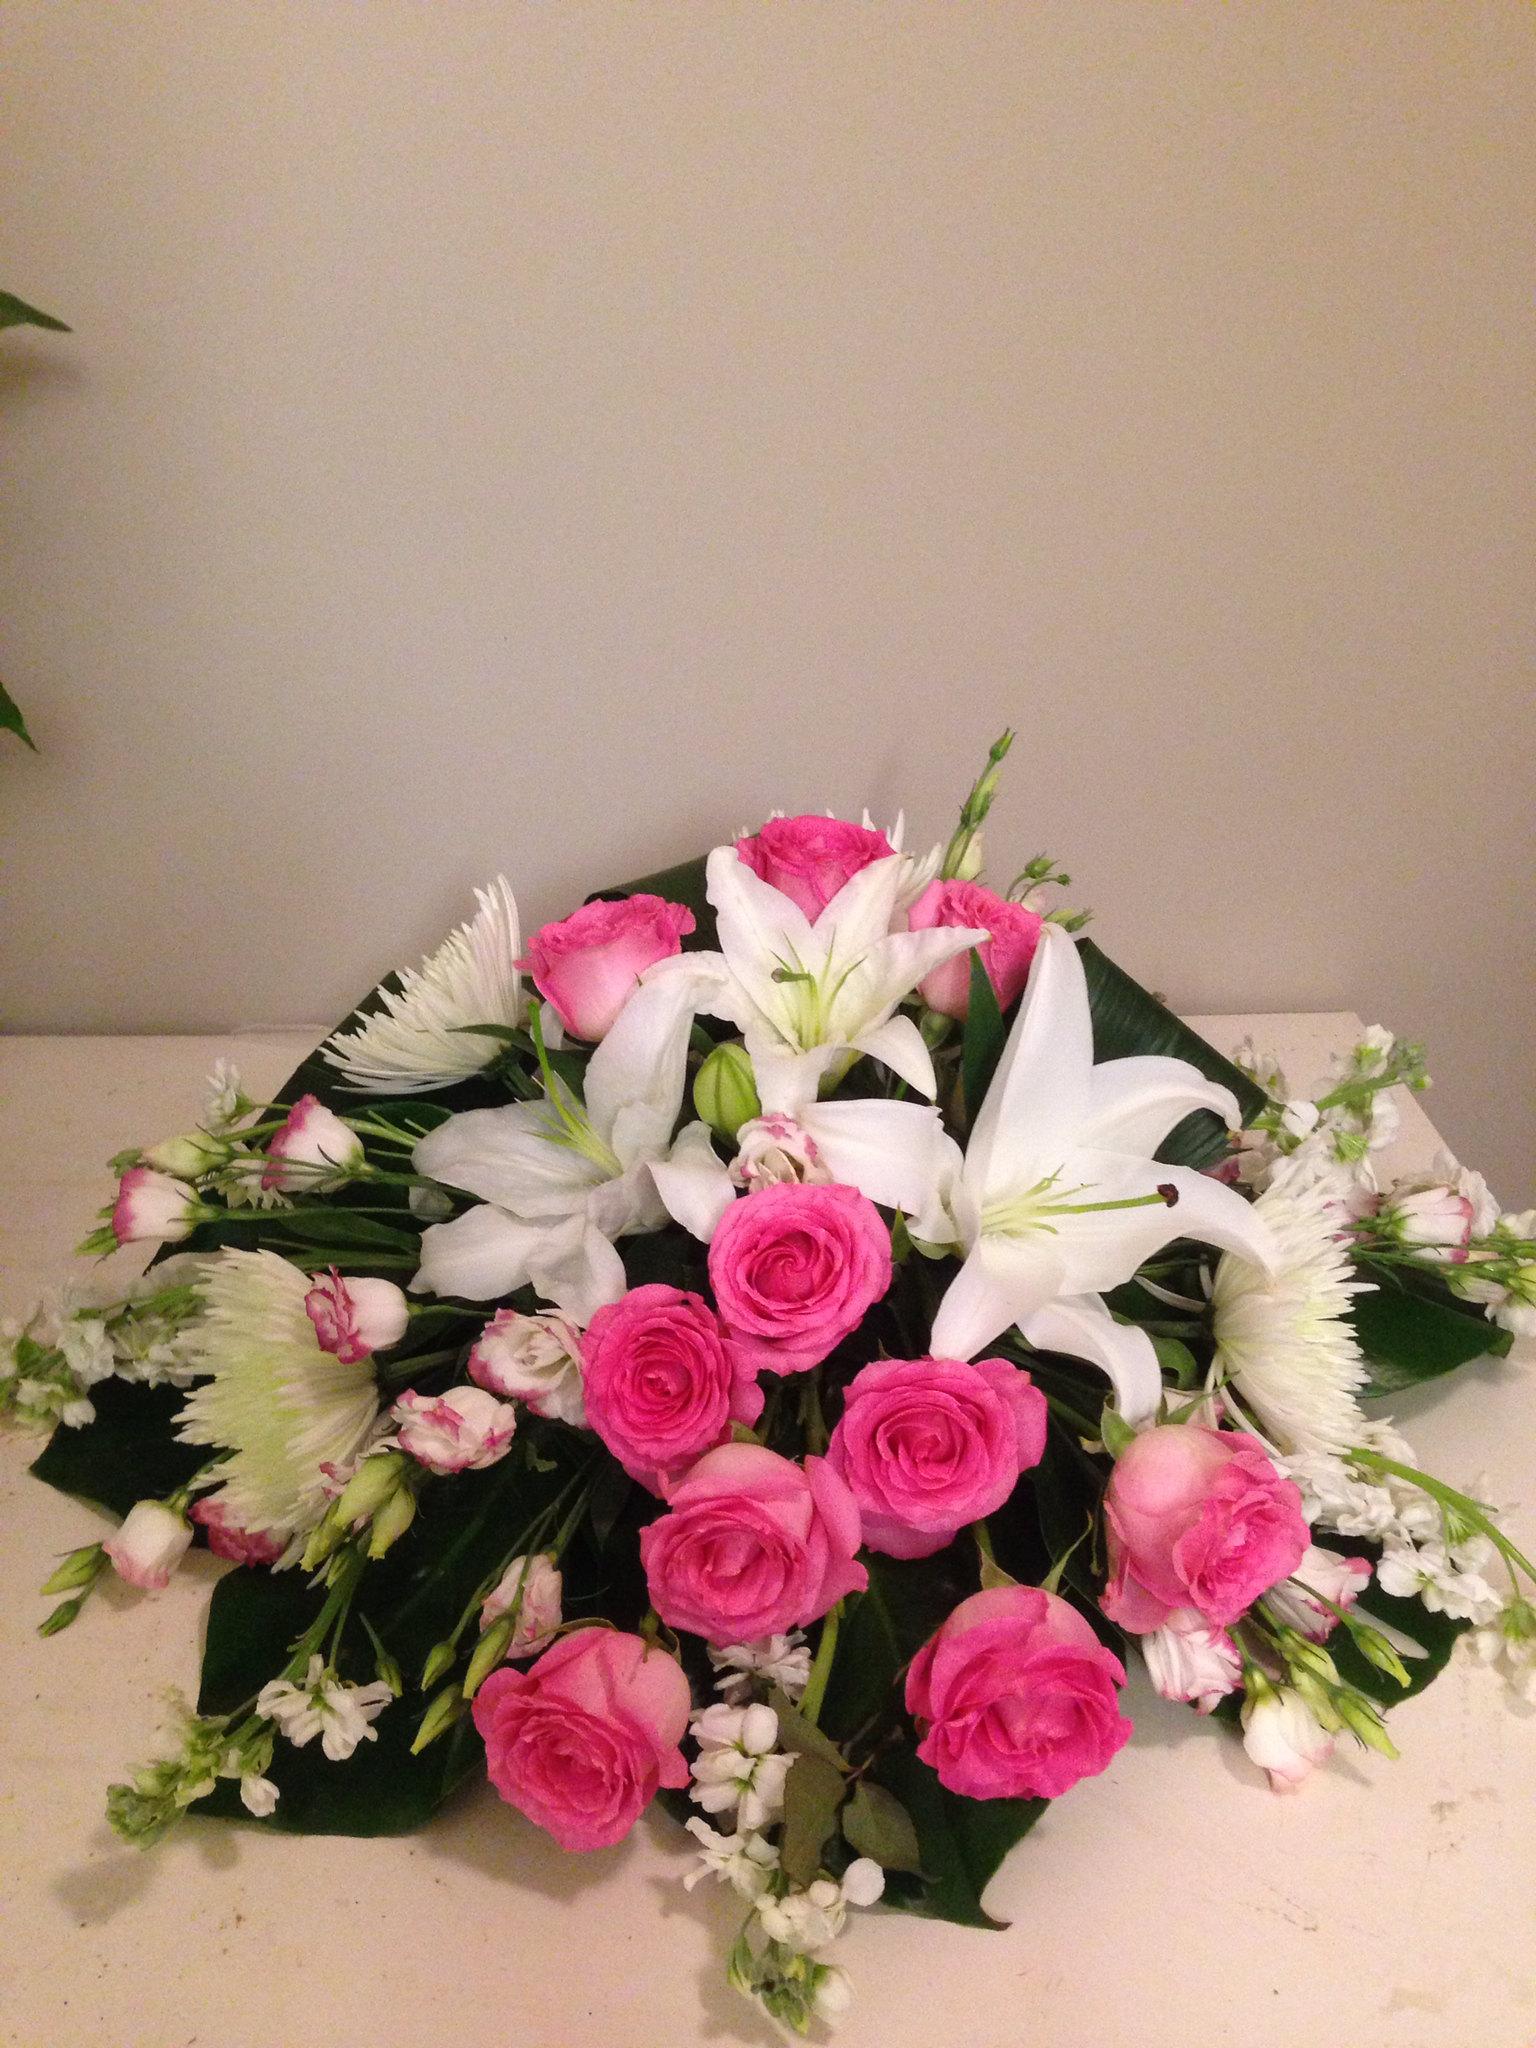 Farah florist  W-A 01   $80